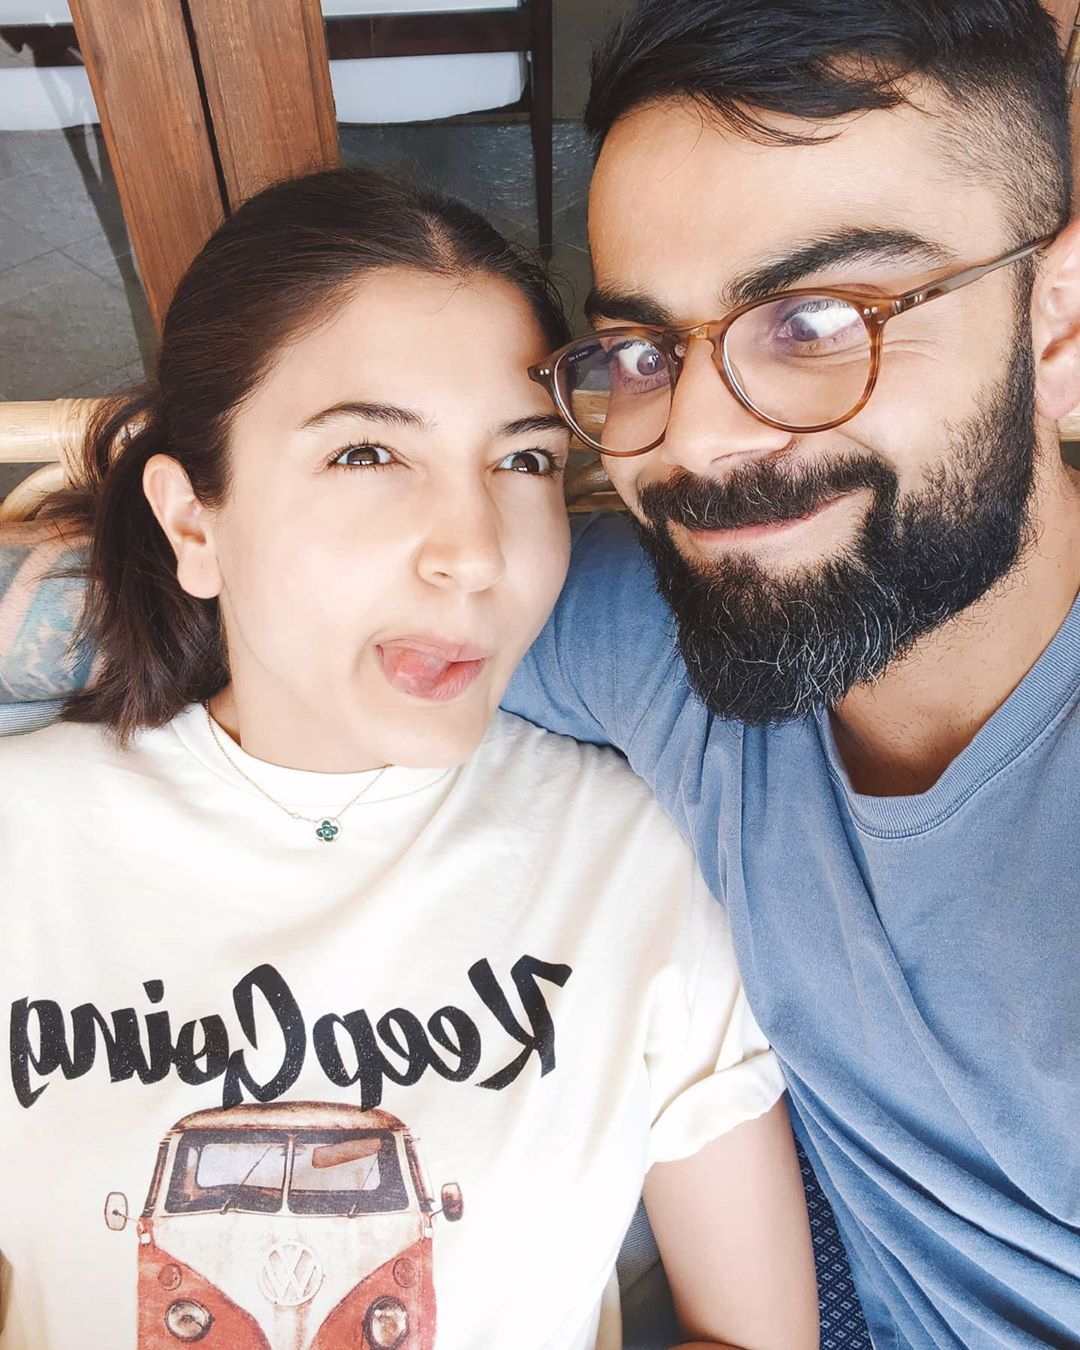 Coronavirus Anushka Sharma Cuts Husband Virat Kohli S Hair The Express Tribune